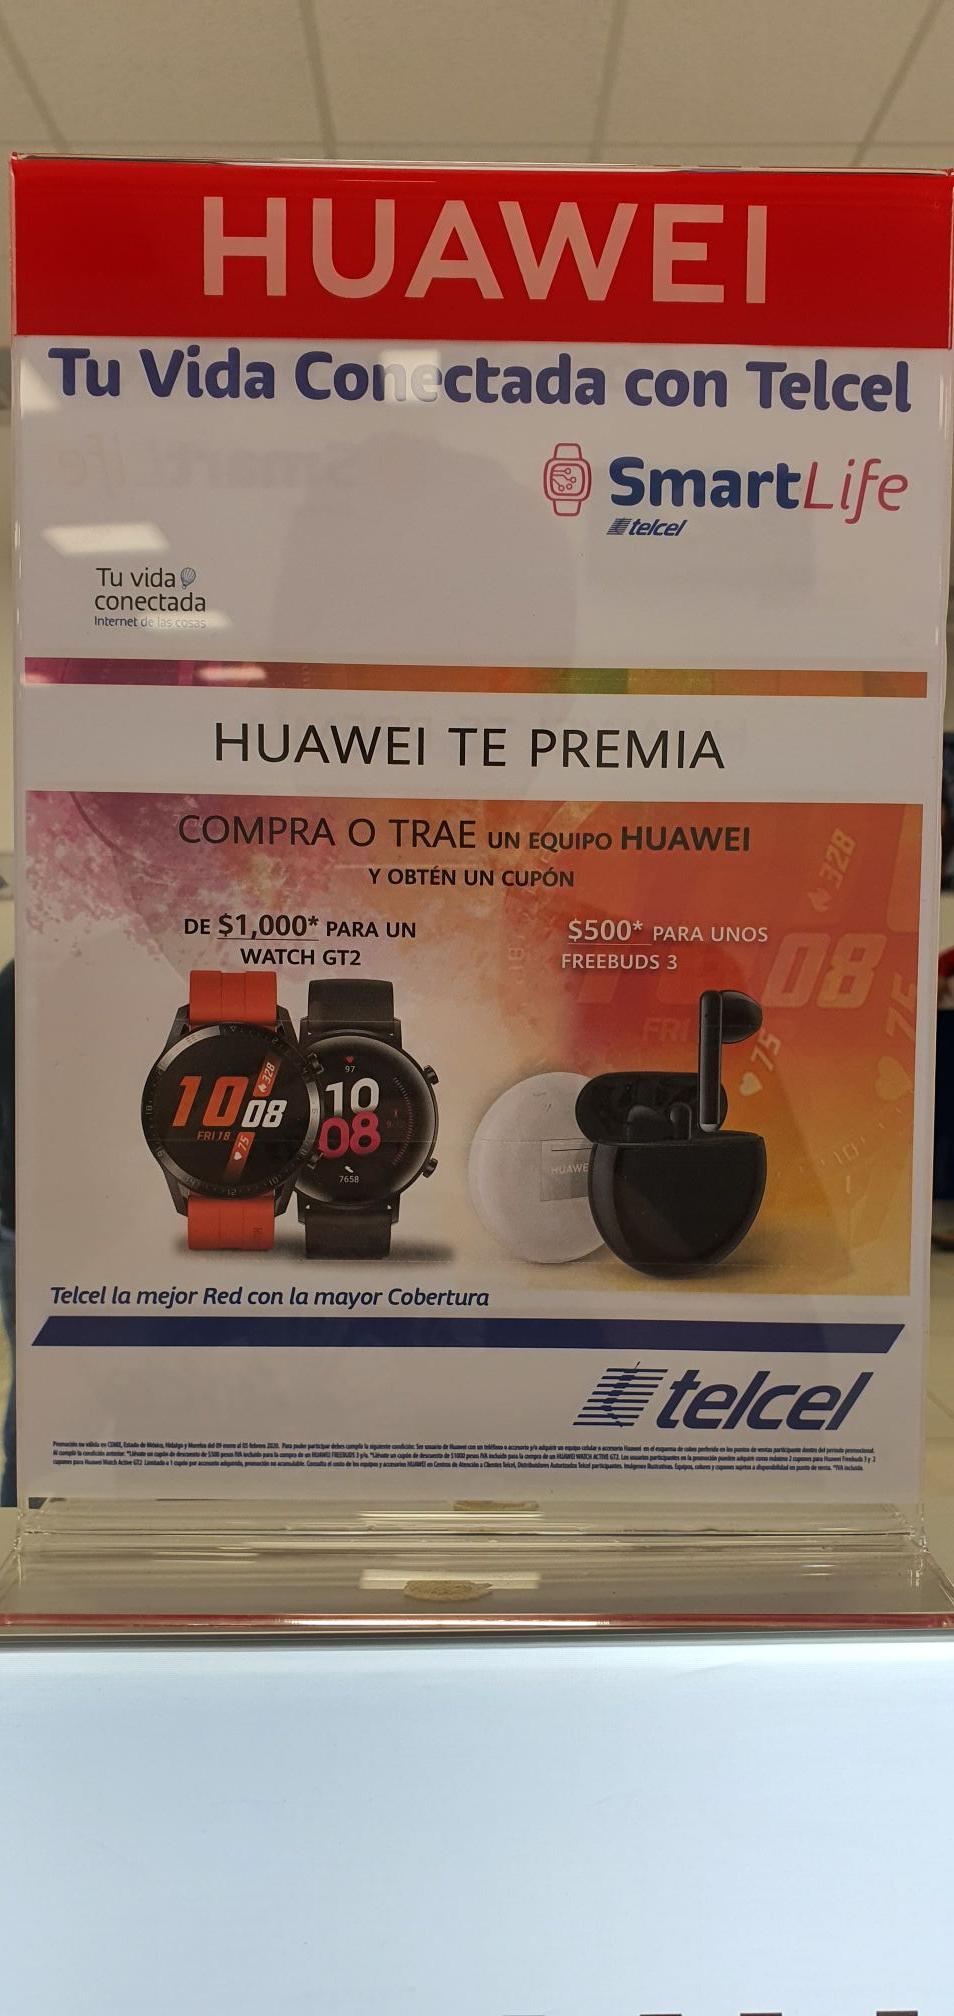 Telcel: $1,000 descuento para HUAWEI WATCH GT2